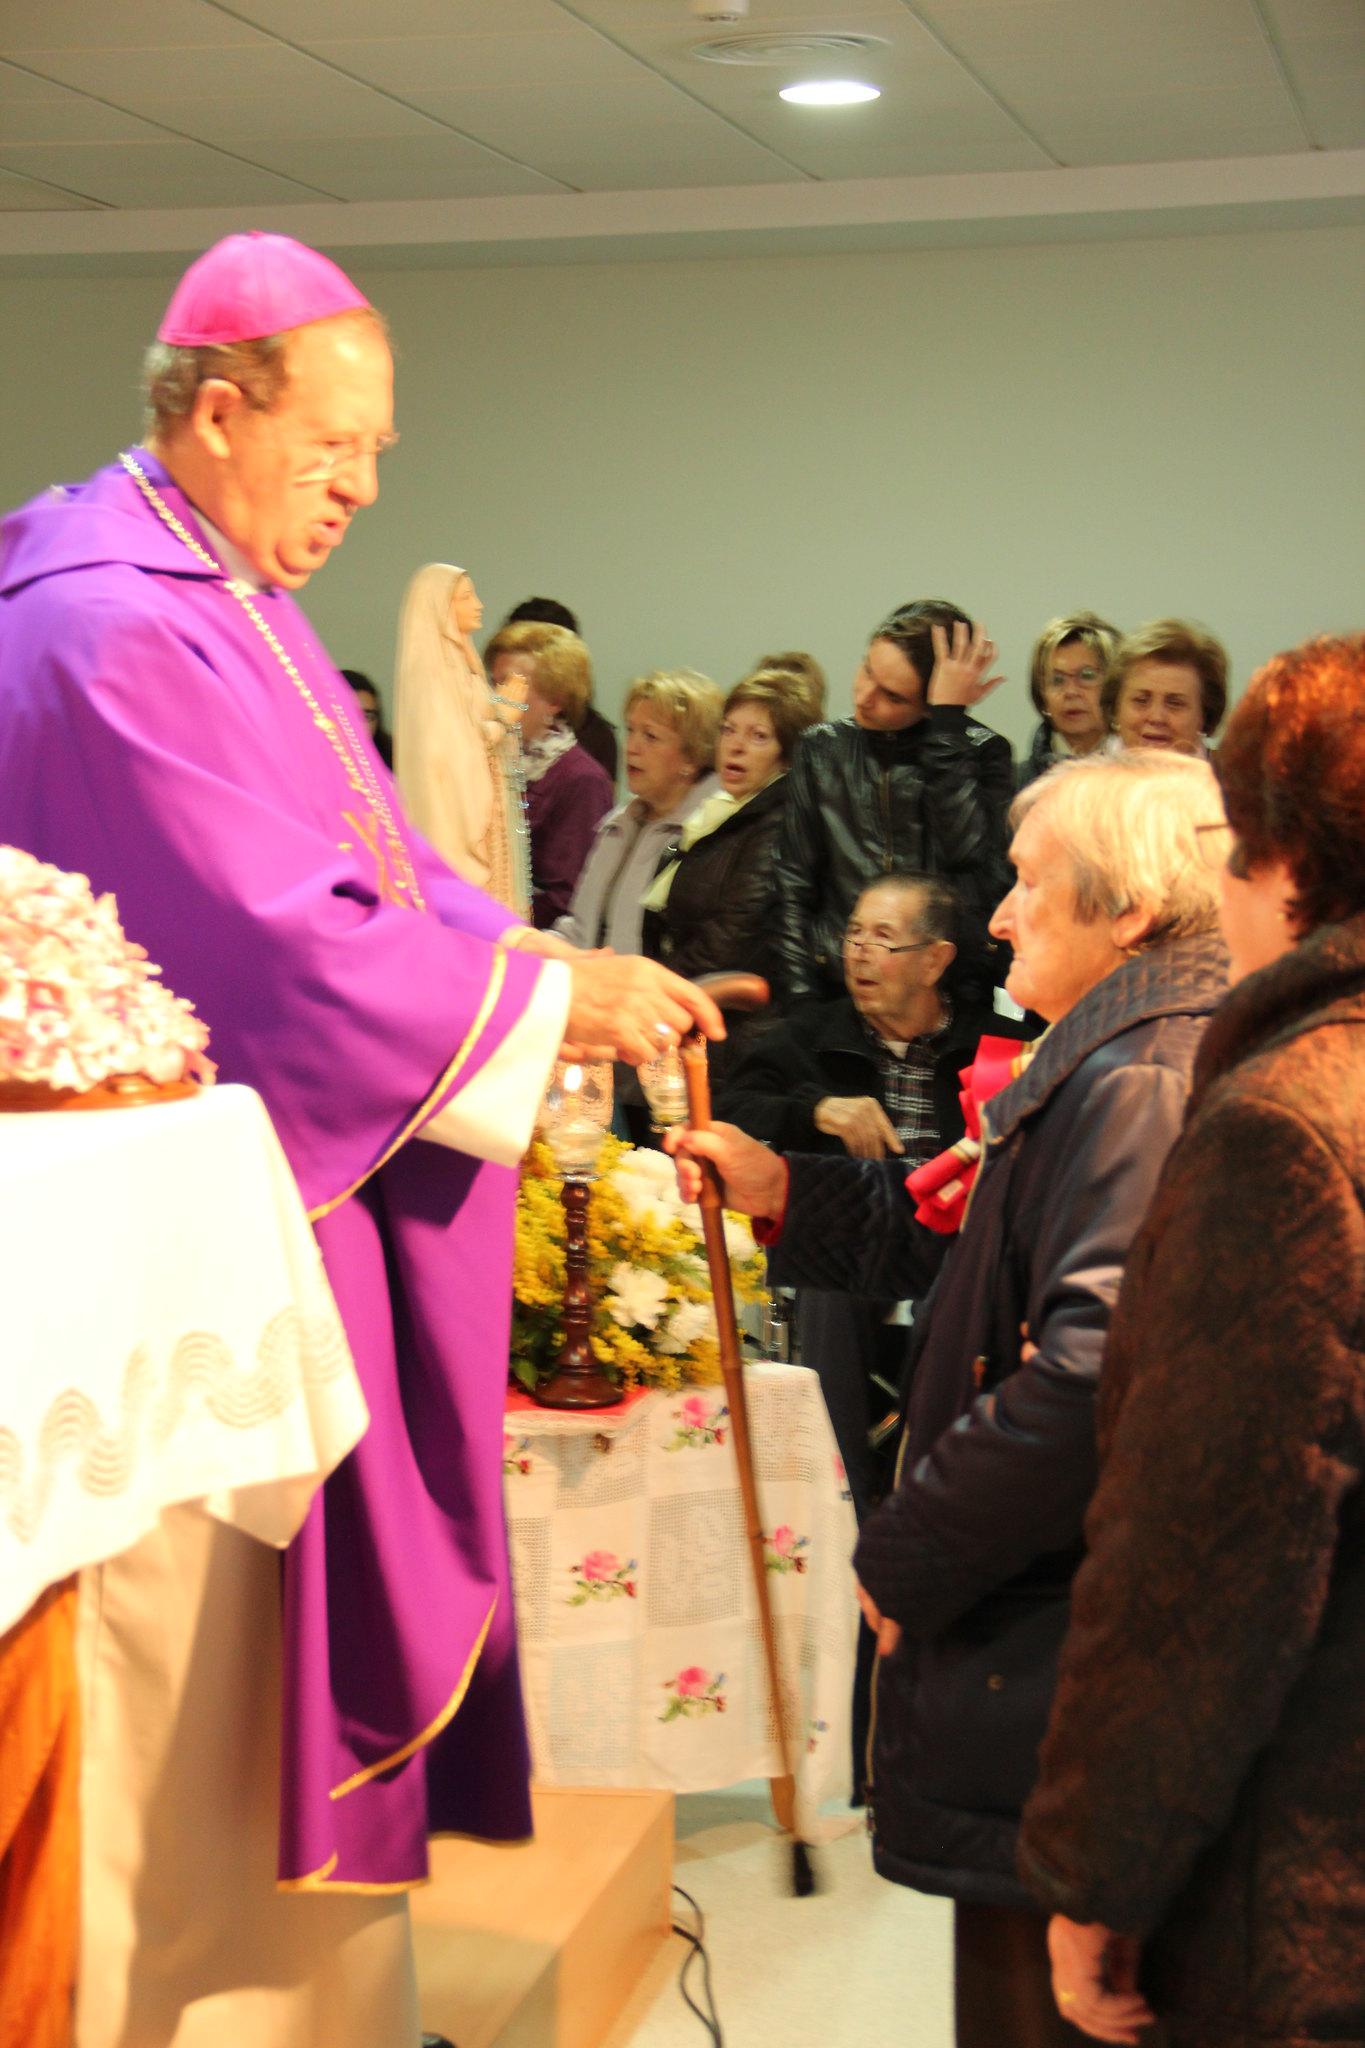 (2016-02-13) - Inauguración Virgen De Lourdes, La Molineta - Archivo La Molineta (031)